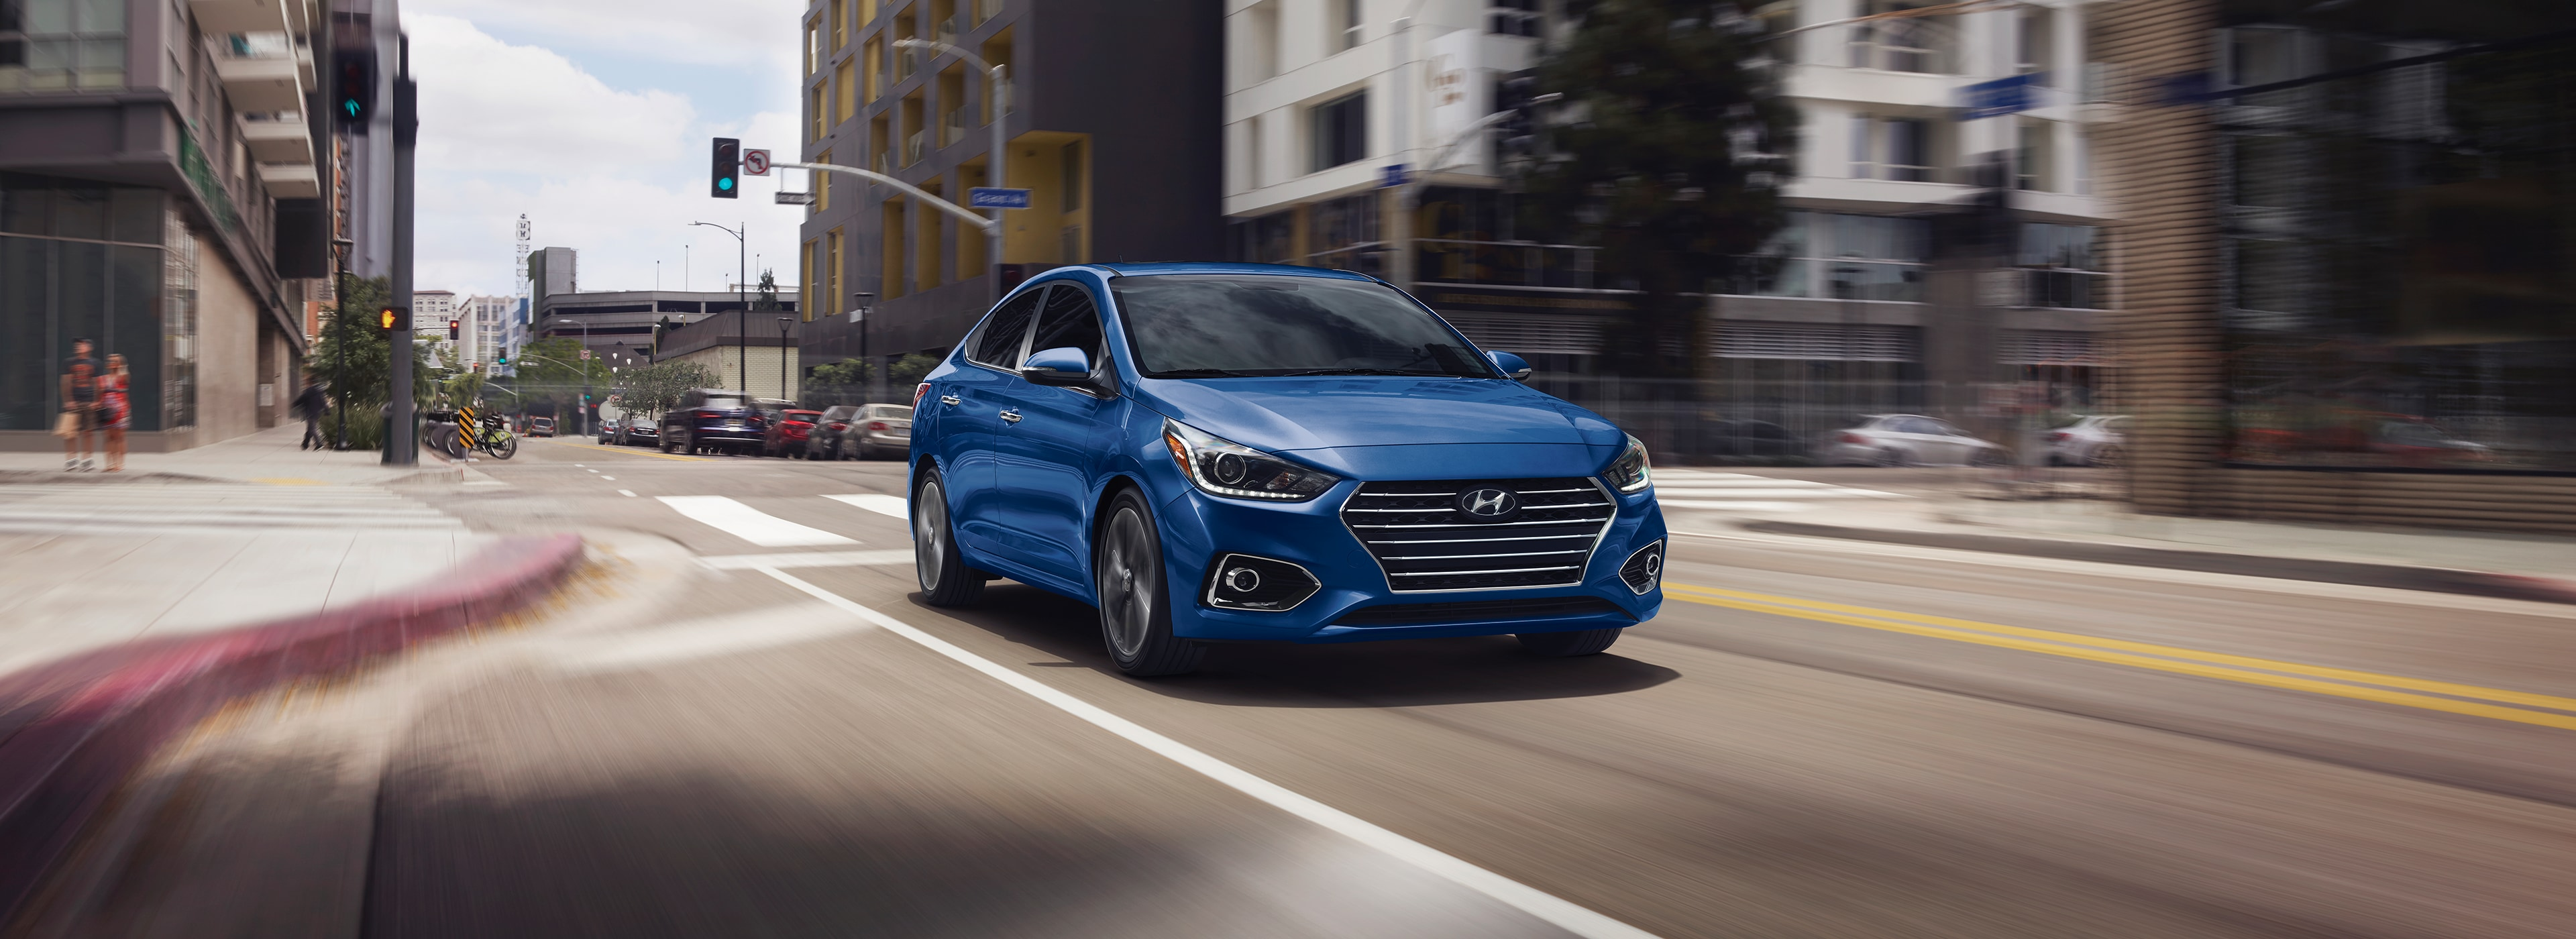 Hyundai Accent Reviews Ratings Hyundai Canada